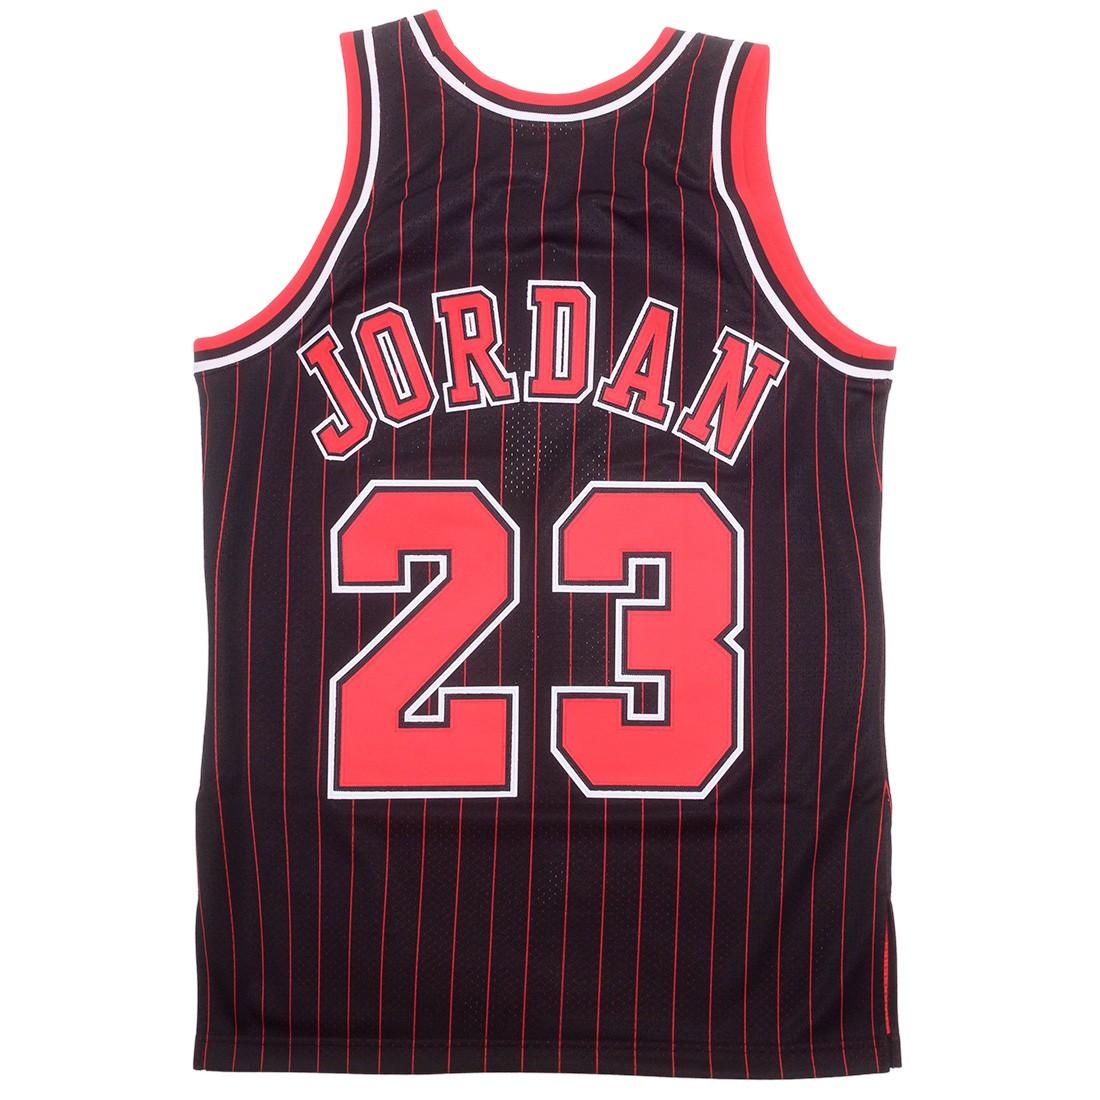 Mitchell And Ness x NBA Men Chicago Bulls Michael Jordan Jersey - Alternative 96 (black)